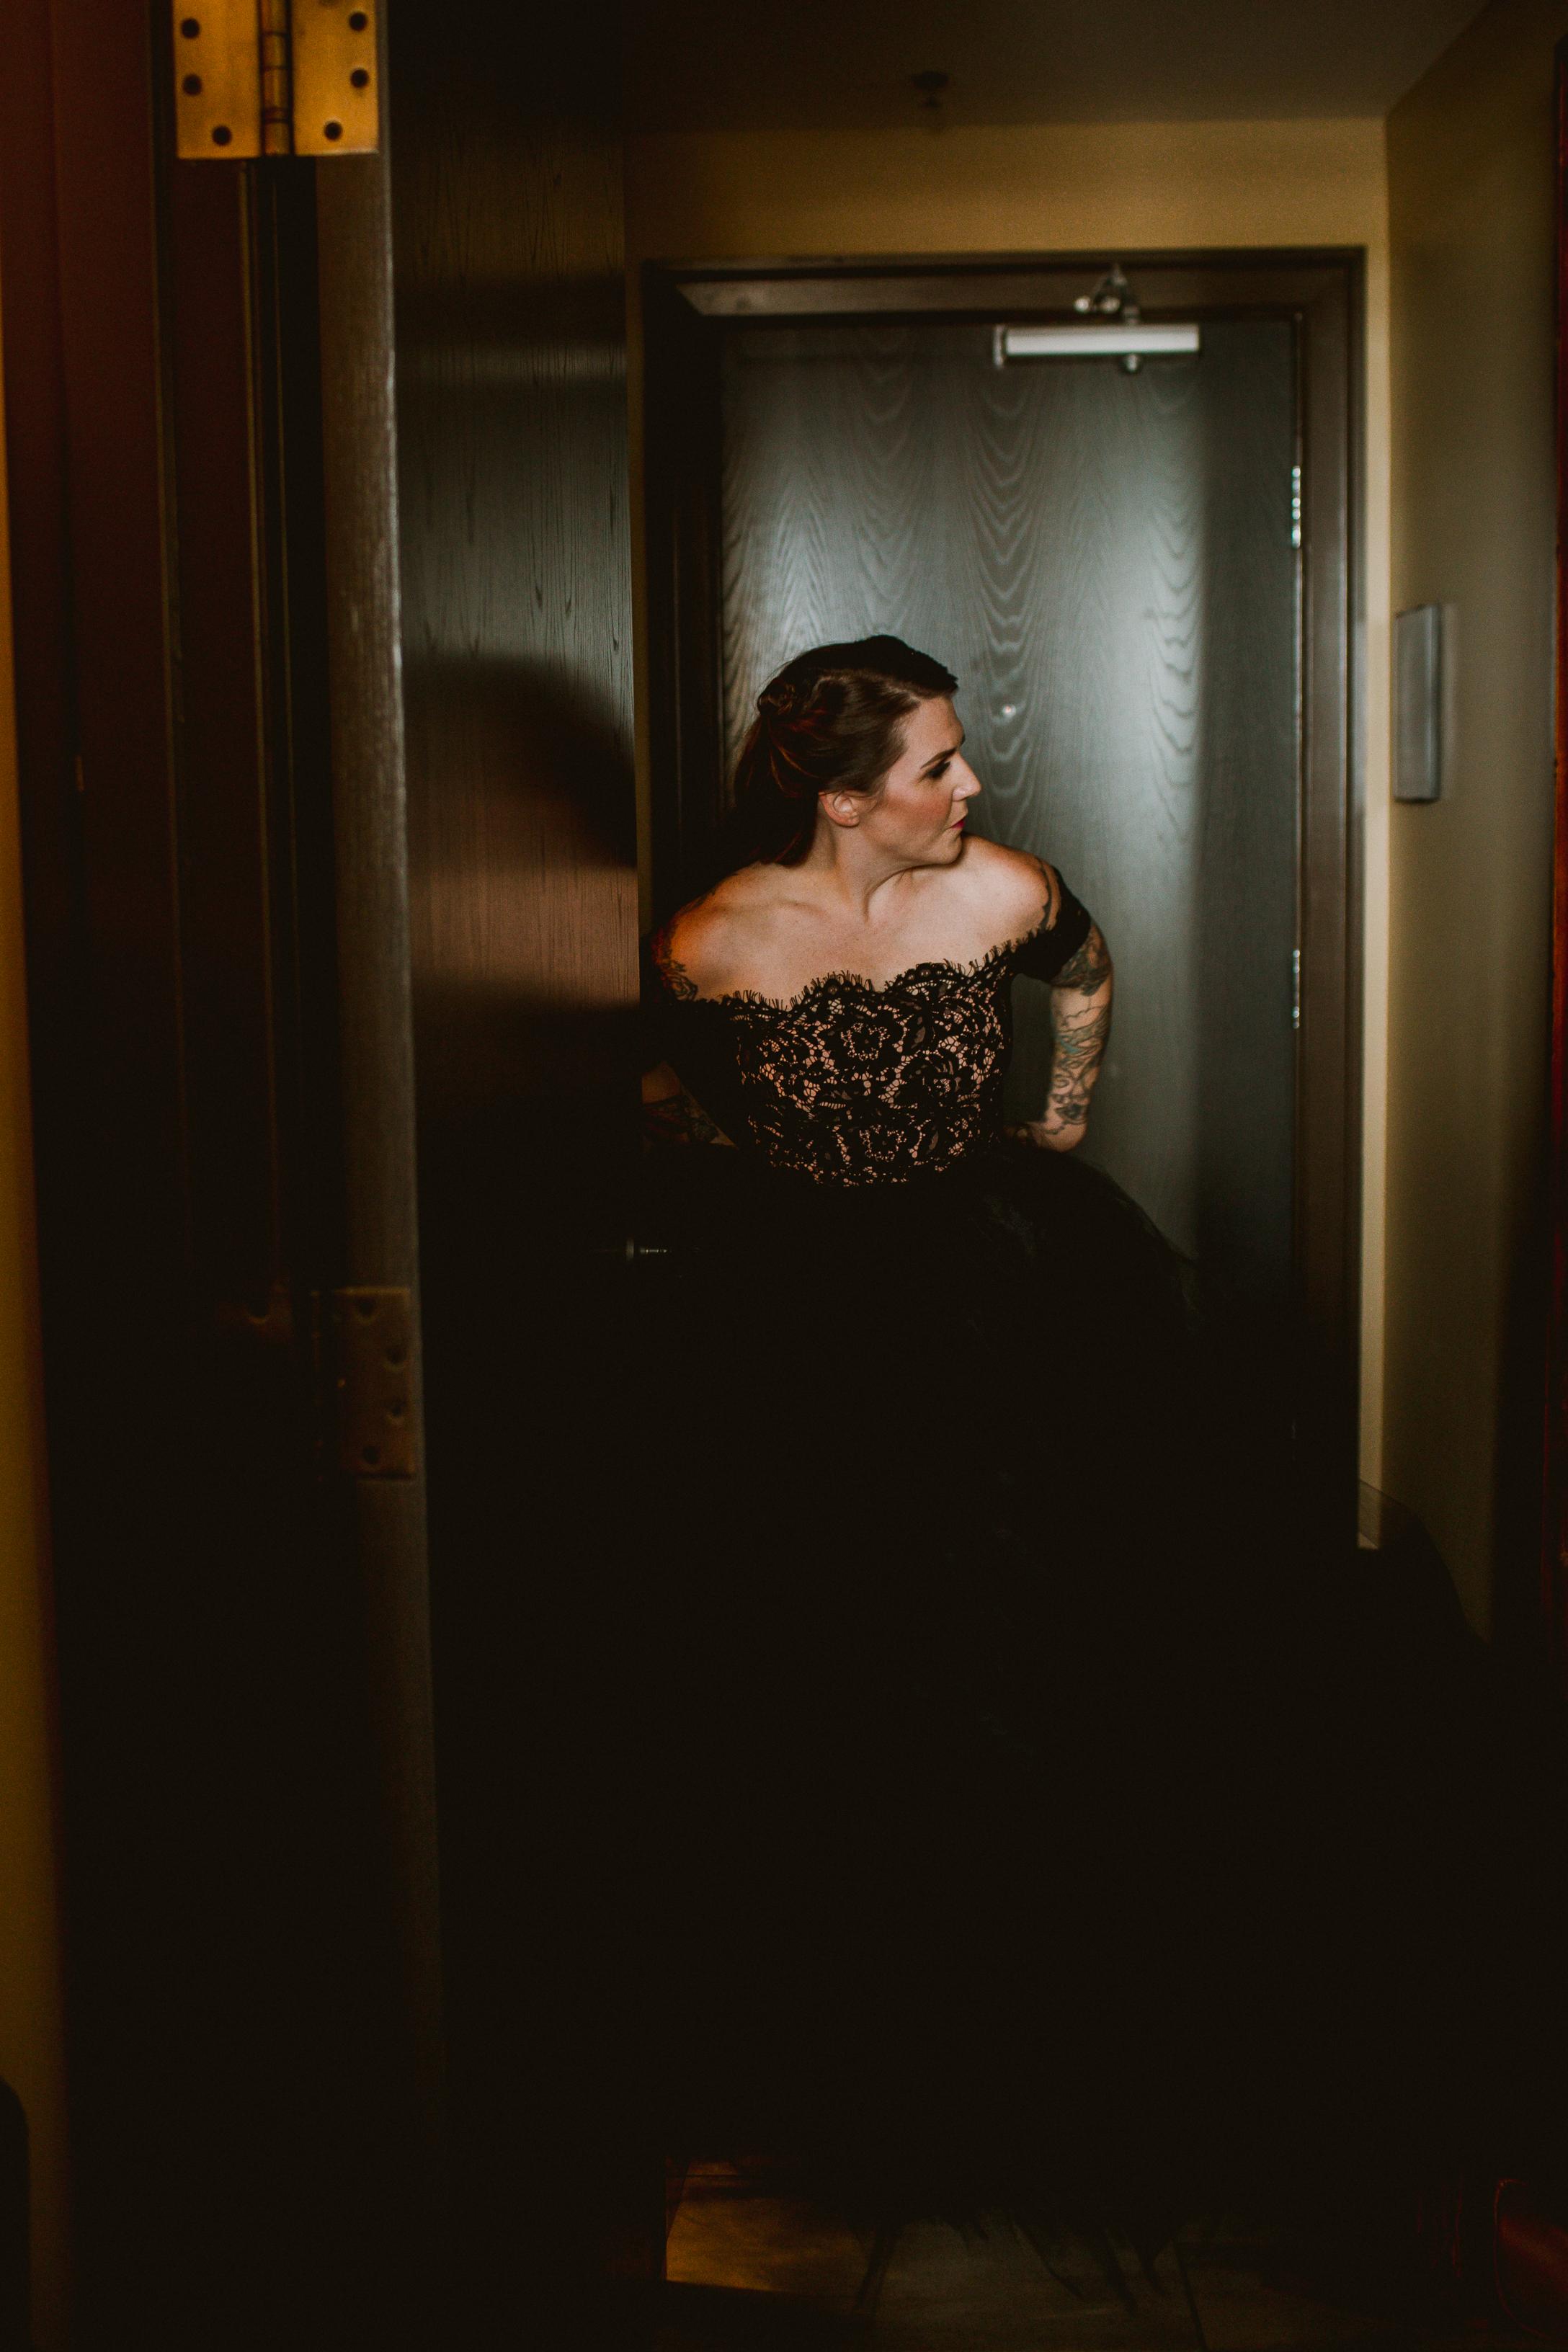 bohemian-hotel-savannah-elopement-kelley-raye-atlanta-wedding-photographer-19.jpg